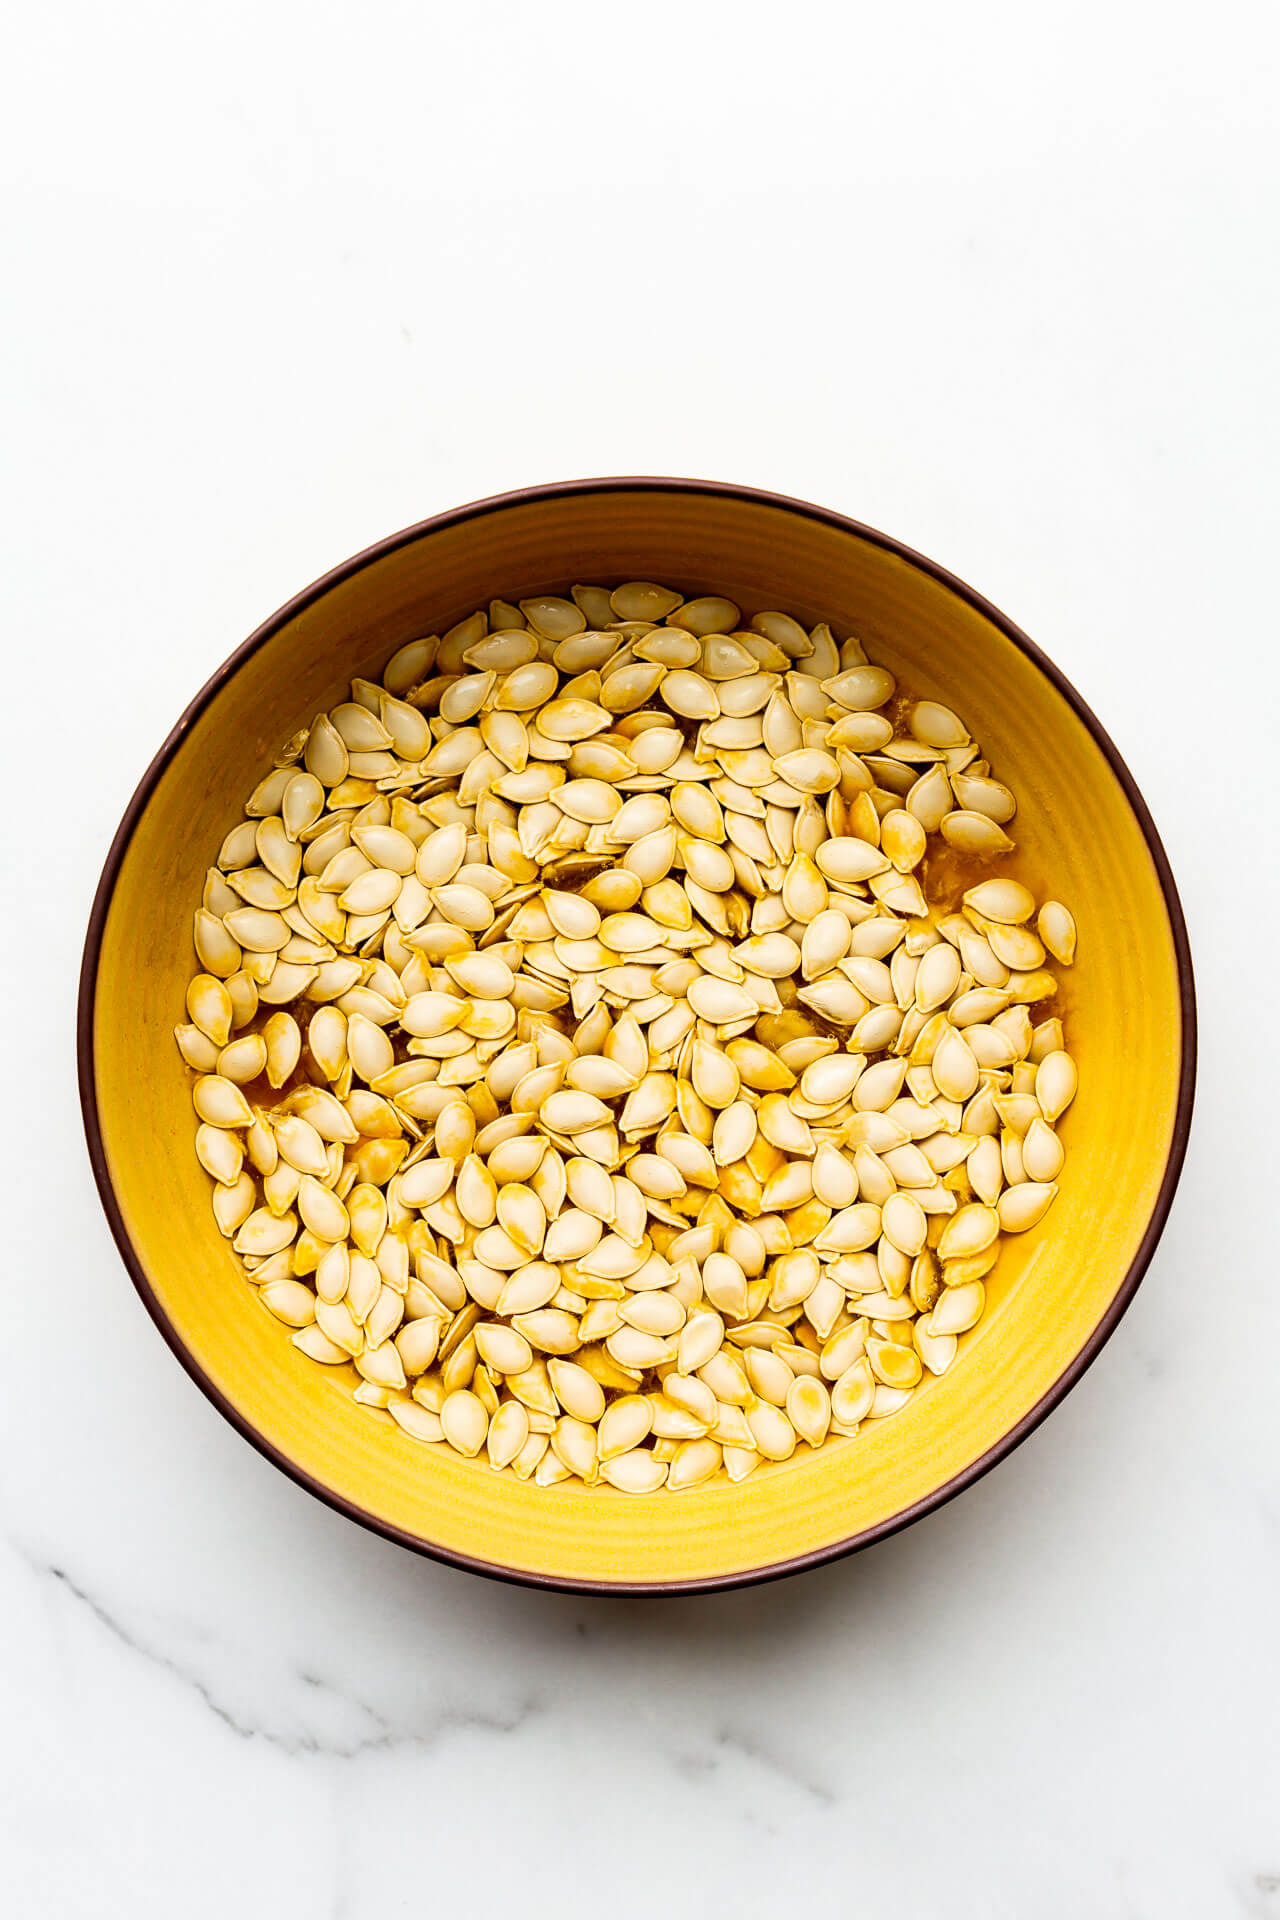 Soak pumpkin seeds in a bowl of water before baking.